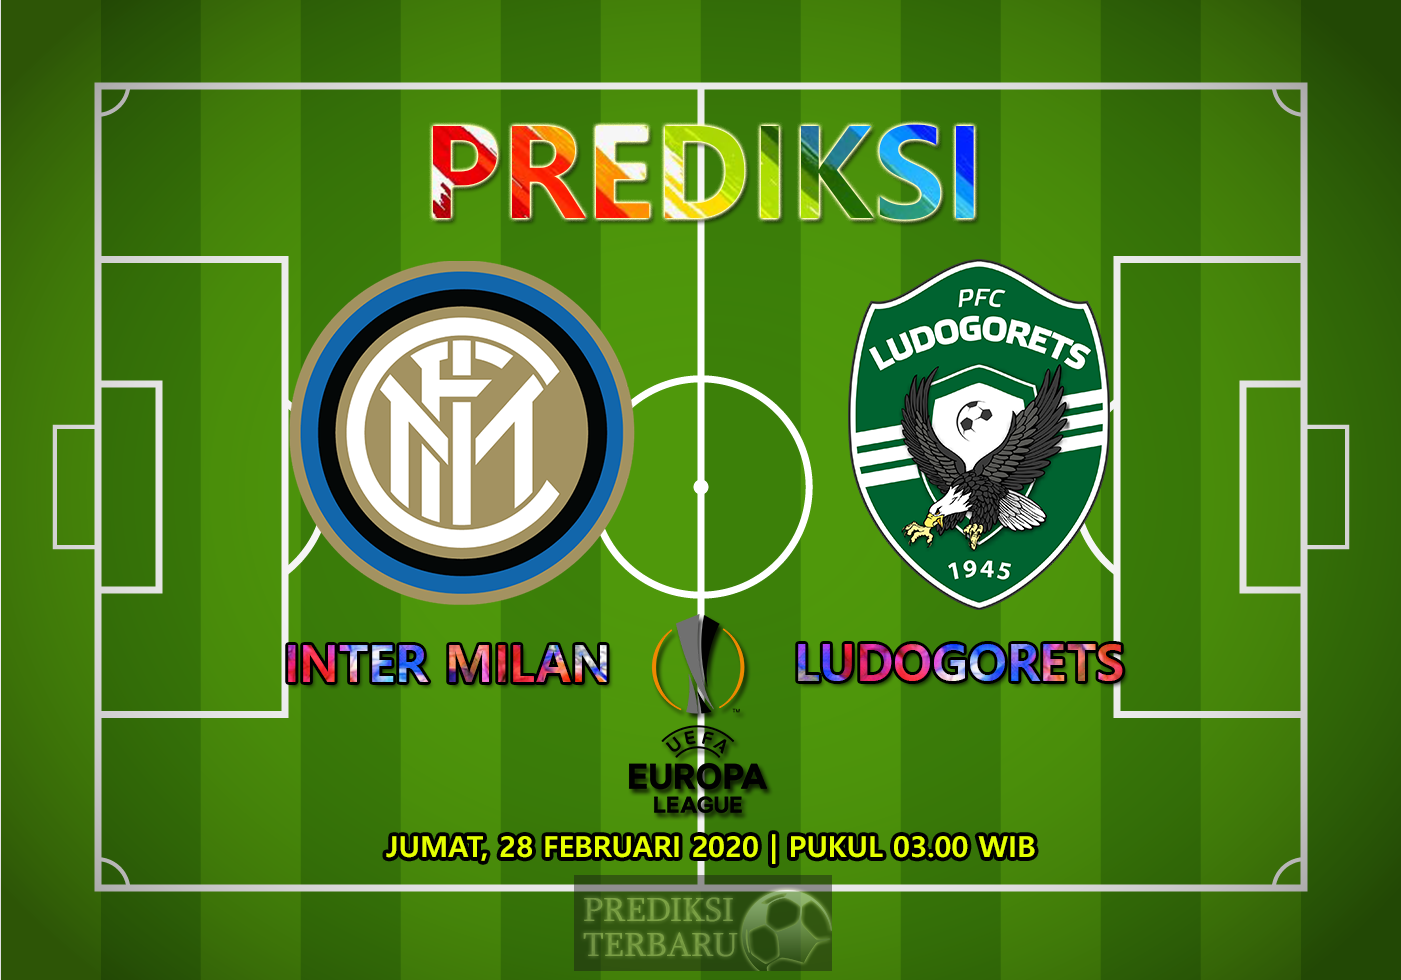 Prediksi Inter Milan Vs Ludogorets Jumat 28 Februari